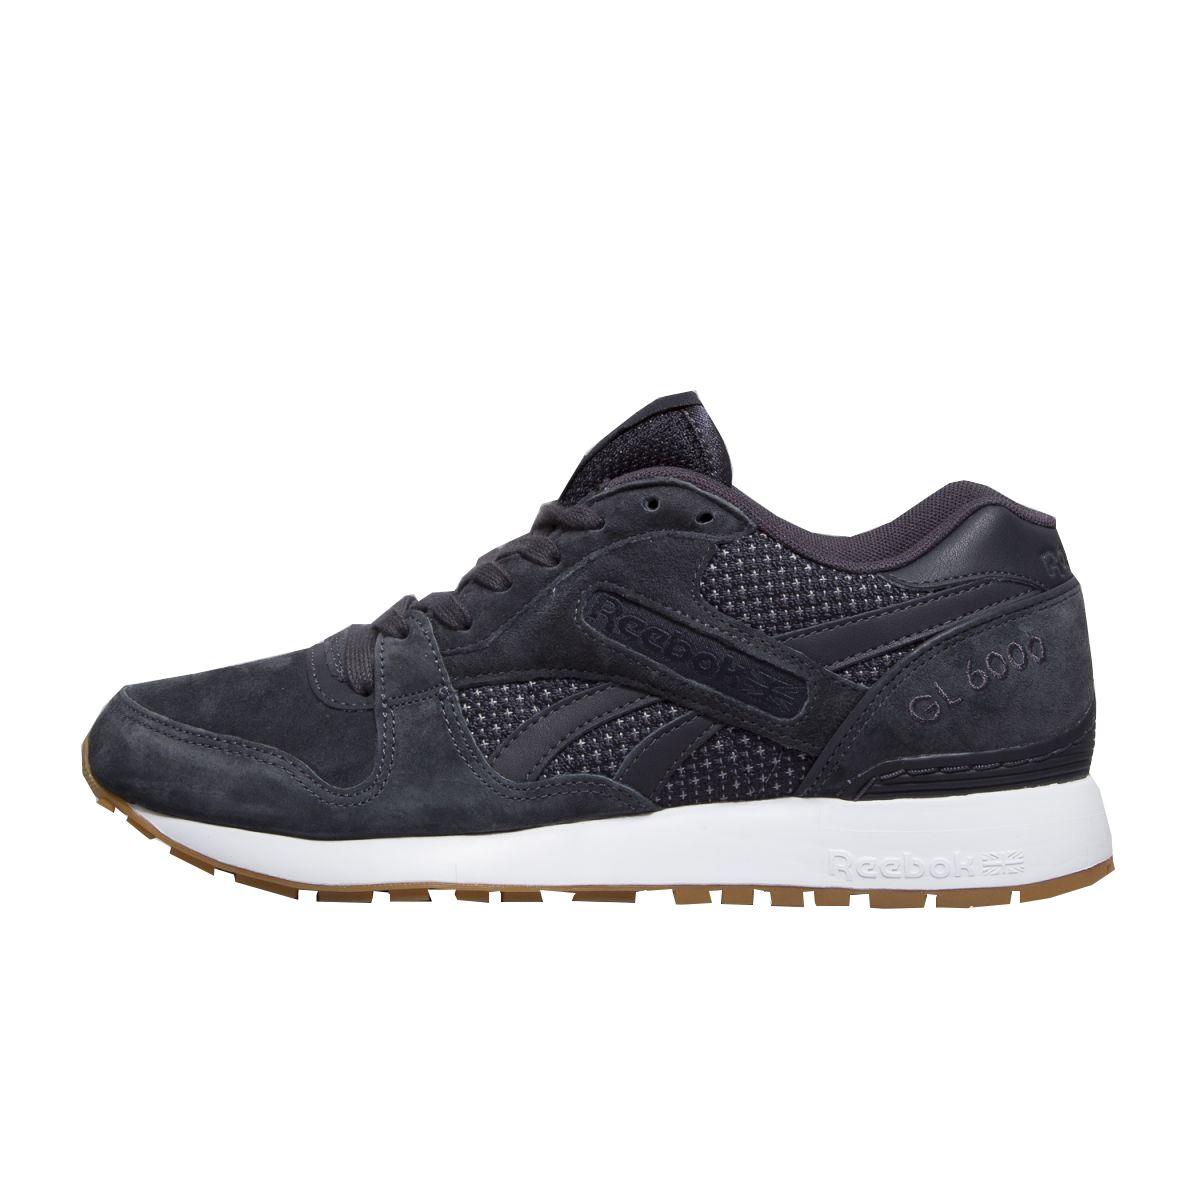 09d873fe59e1 Details about Reebok Classic GL 6000 Premium Tech Leather   Suede Mens  Trainers Shoes BD2679